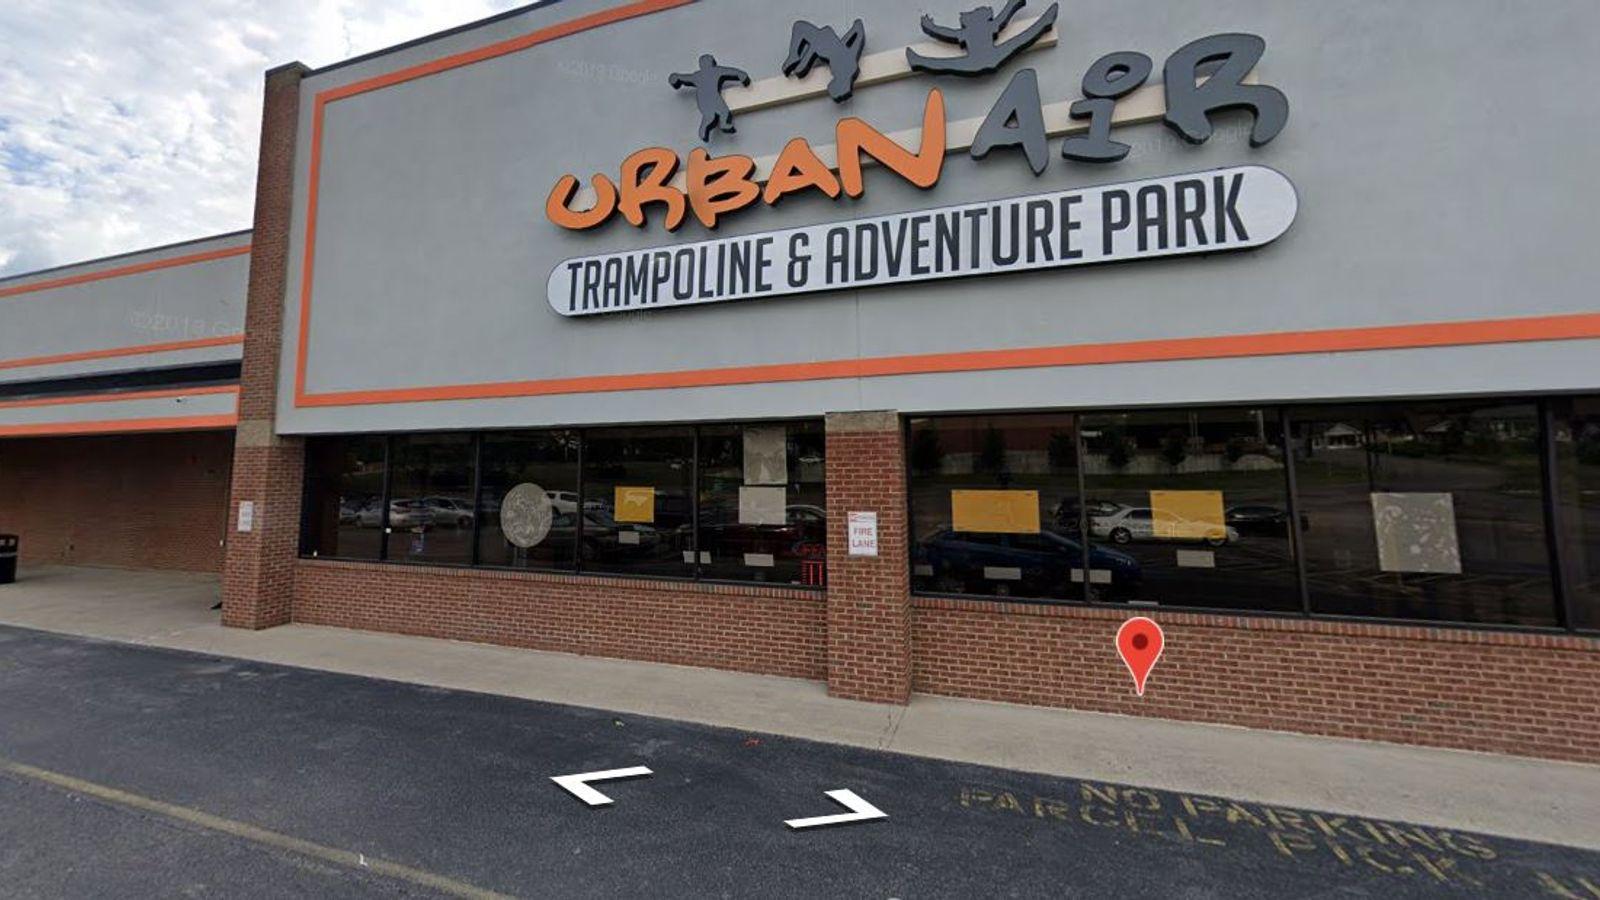 Man shot useless in Nashville whereas 'making prank theft video for YouTube'